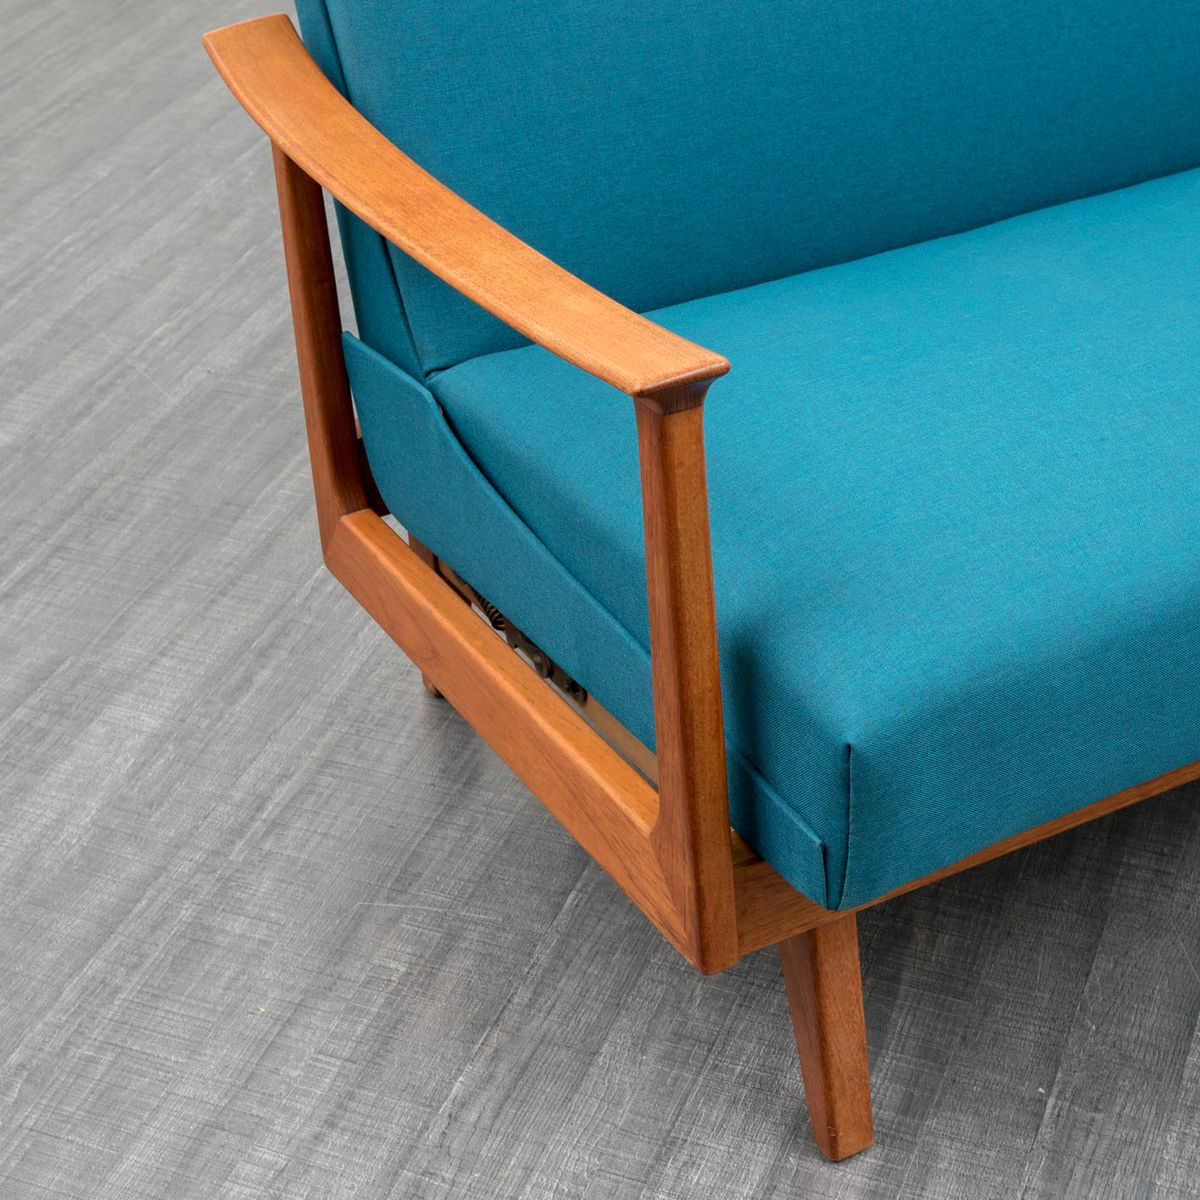 canap pliant scandinave en teck 1960s en vente sur pamono. Black Bedroom Furniture Sets. Home Design Ideas